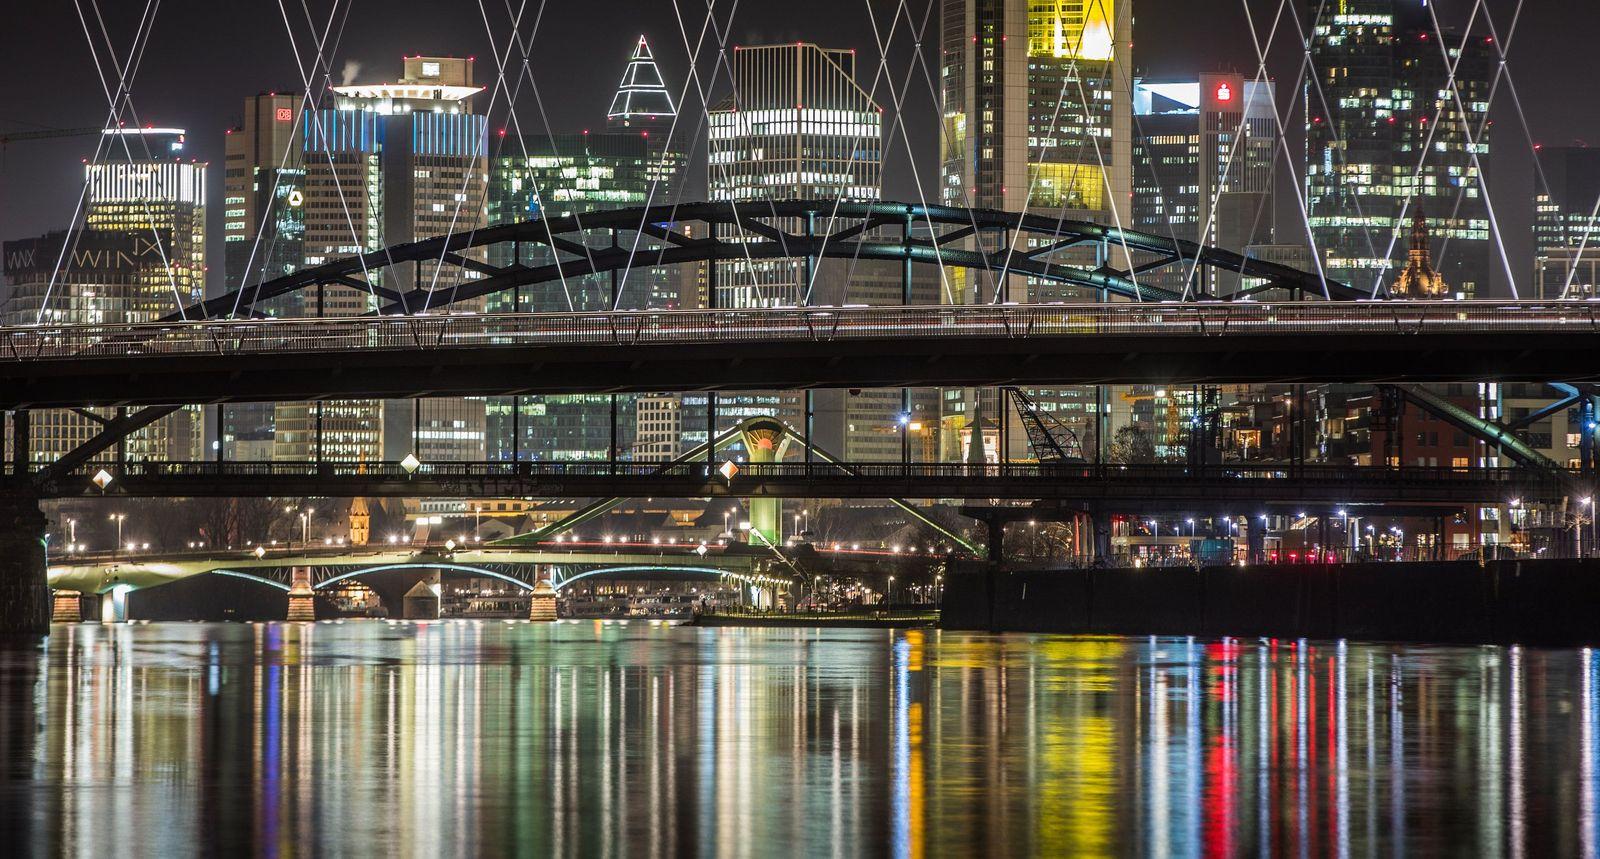 Frankfurt nachts / Hochhauskulisse